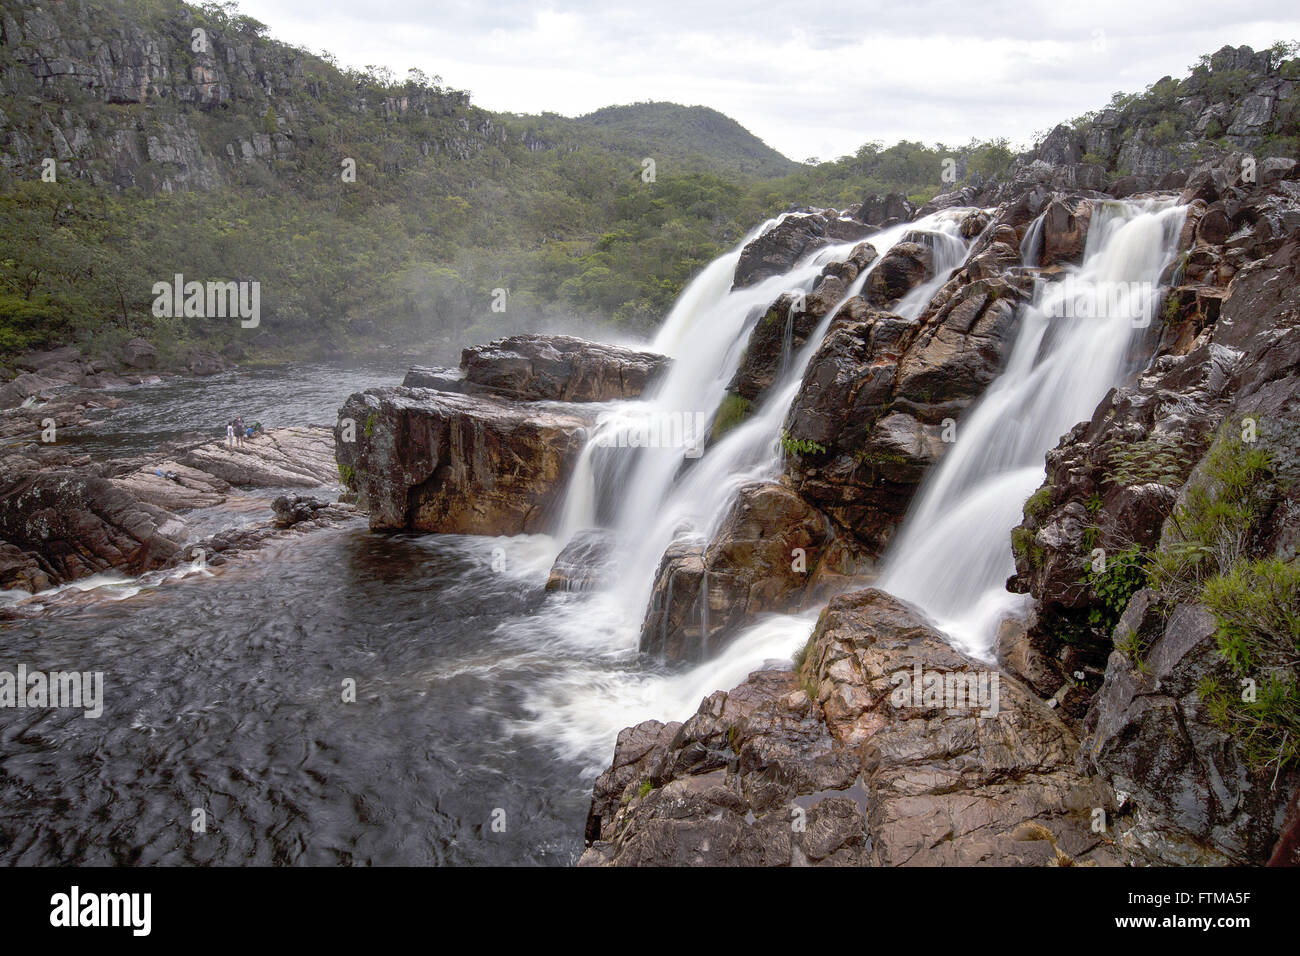 Waterfall of the Cariocas - Chapada dos Veadeiros National Park - Stock Image